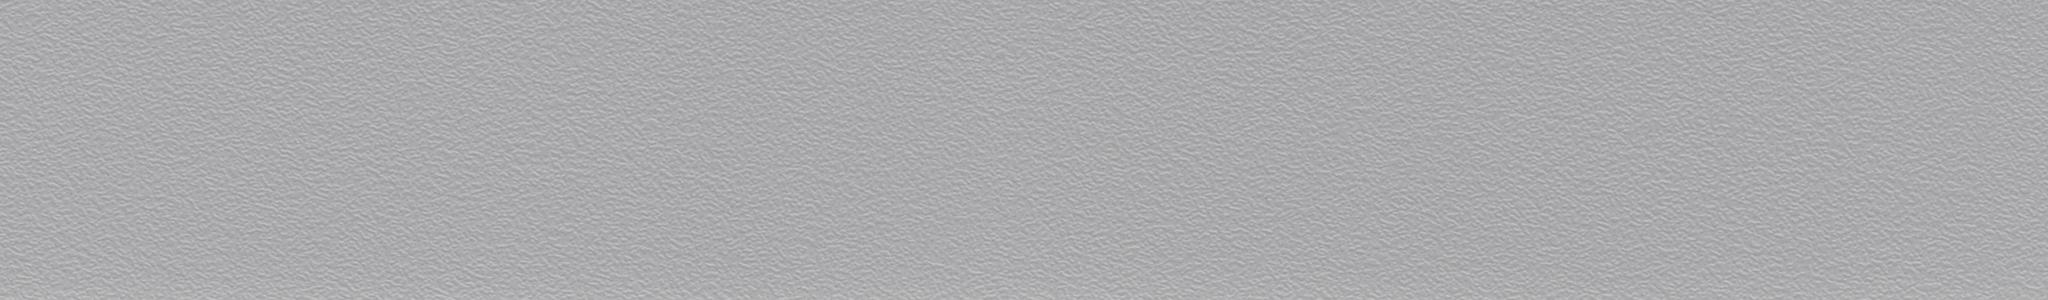 HU 172115 Кромка ABS Платиновый Серый - Шагрень XG